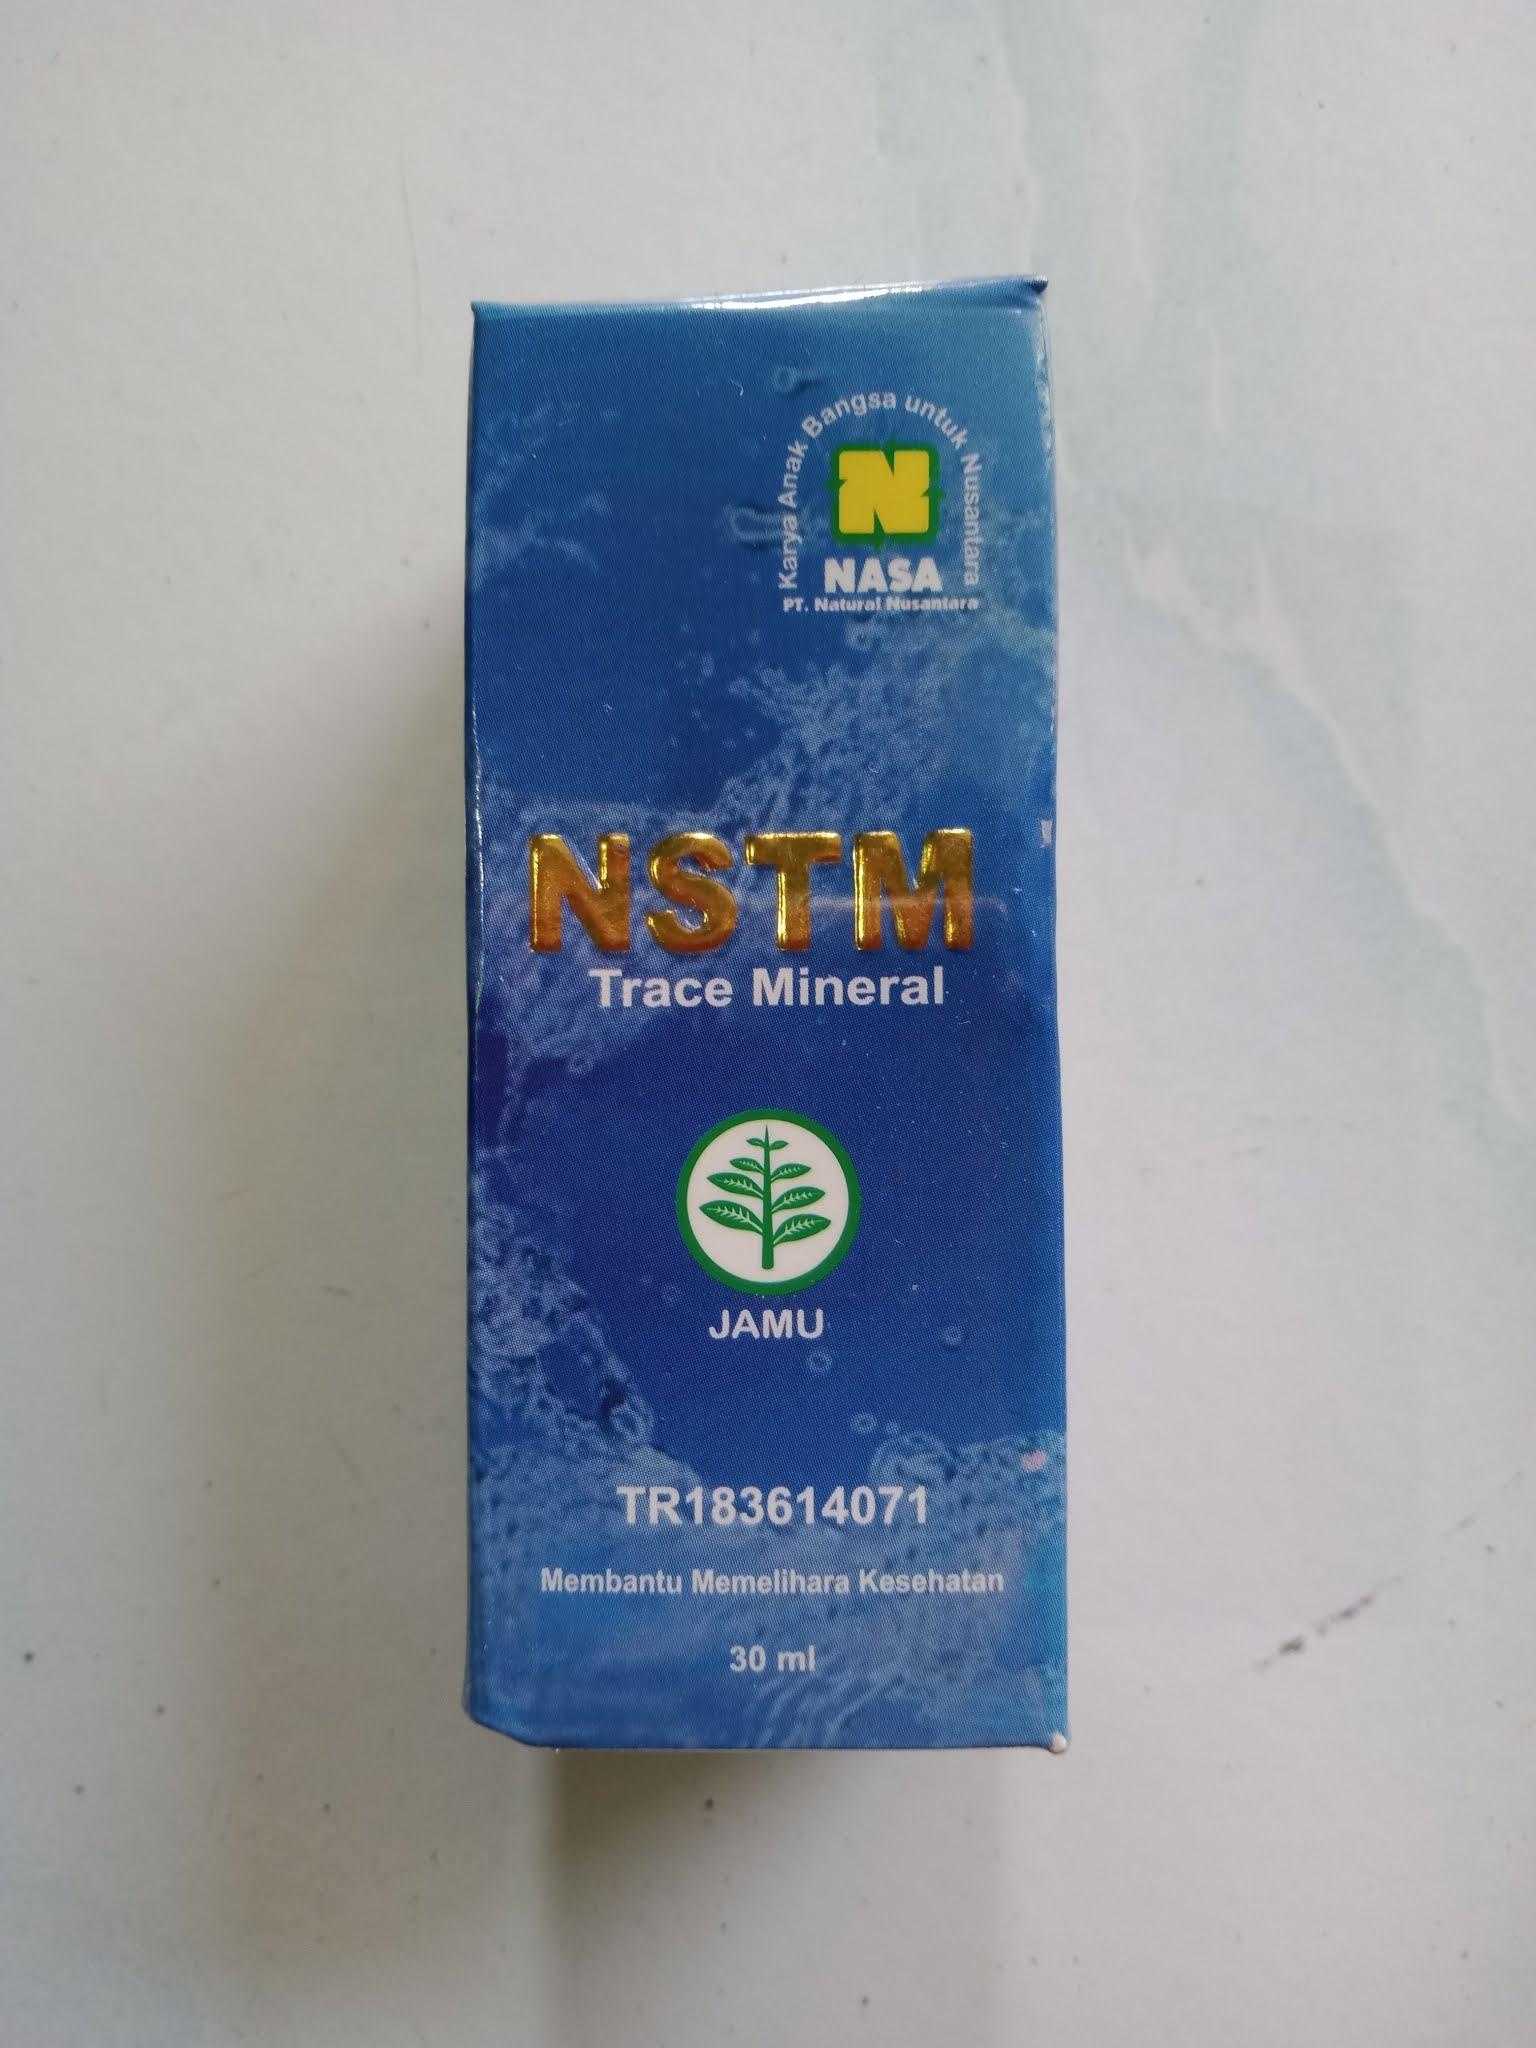 Jual NSTM Nasa_Super Trace_Mineral